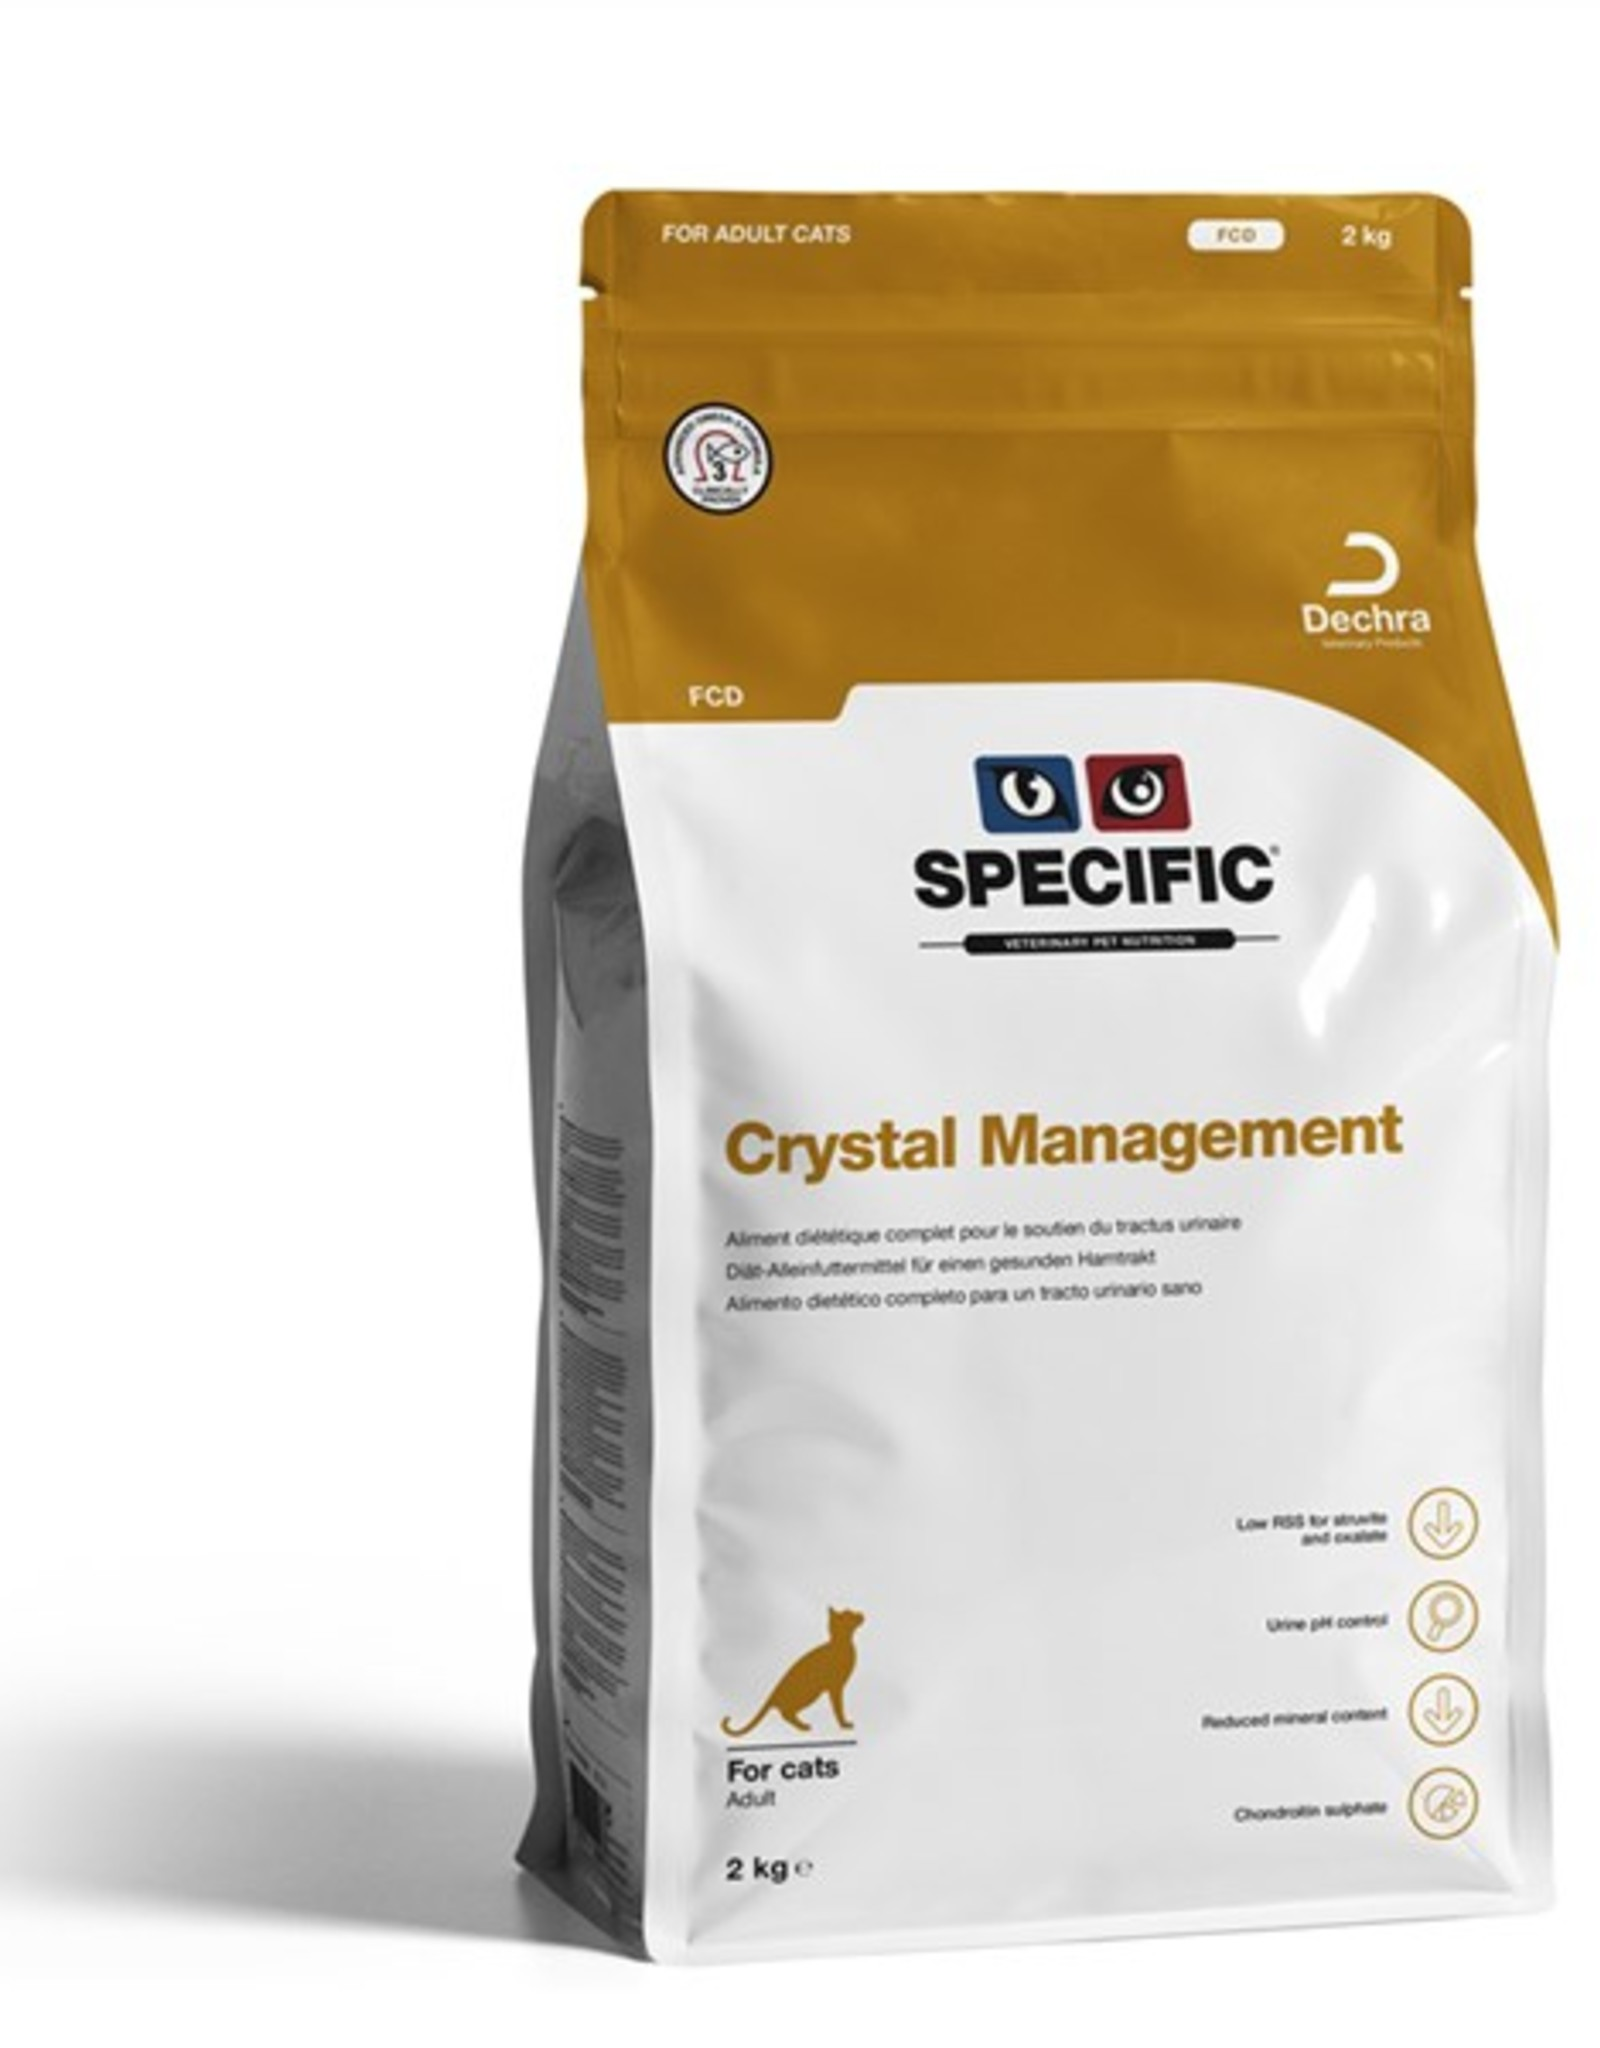 Specific Specific Fcd Crystal Management Kat 2kg